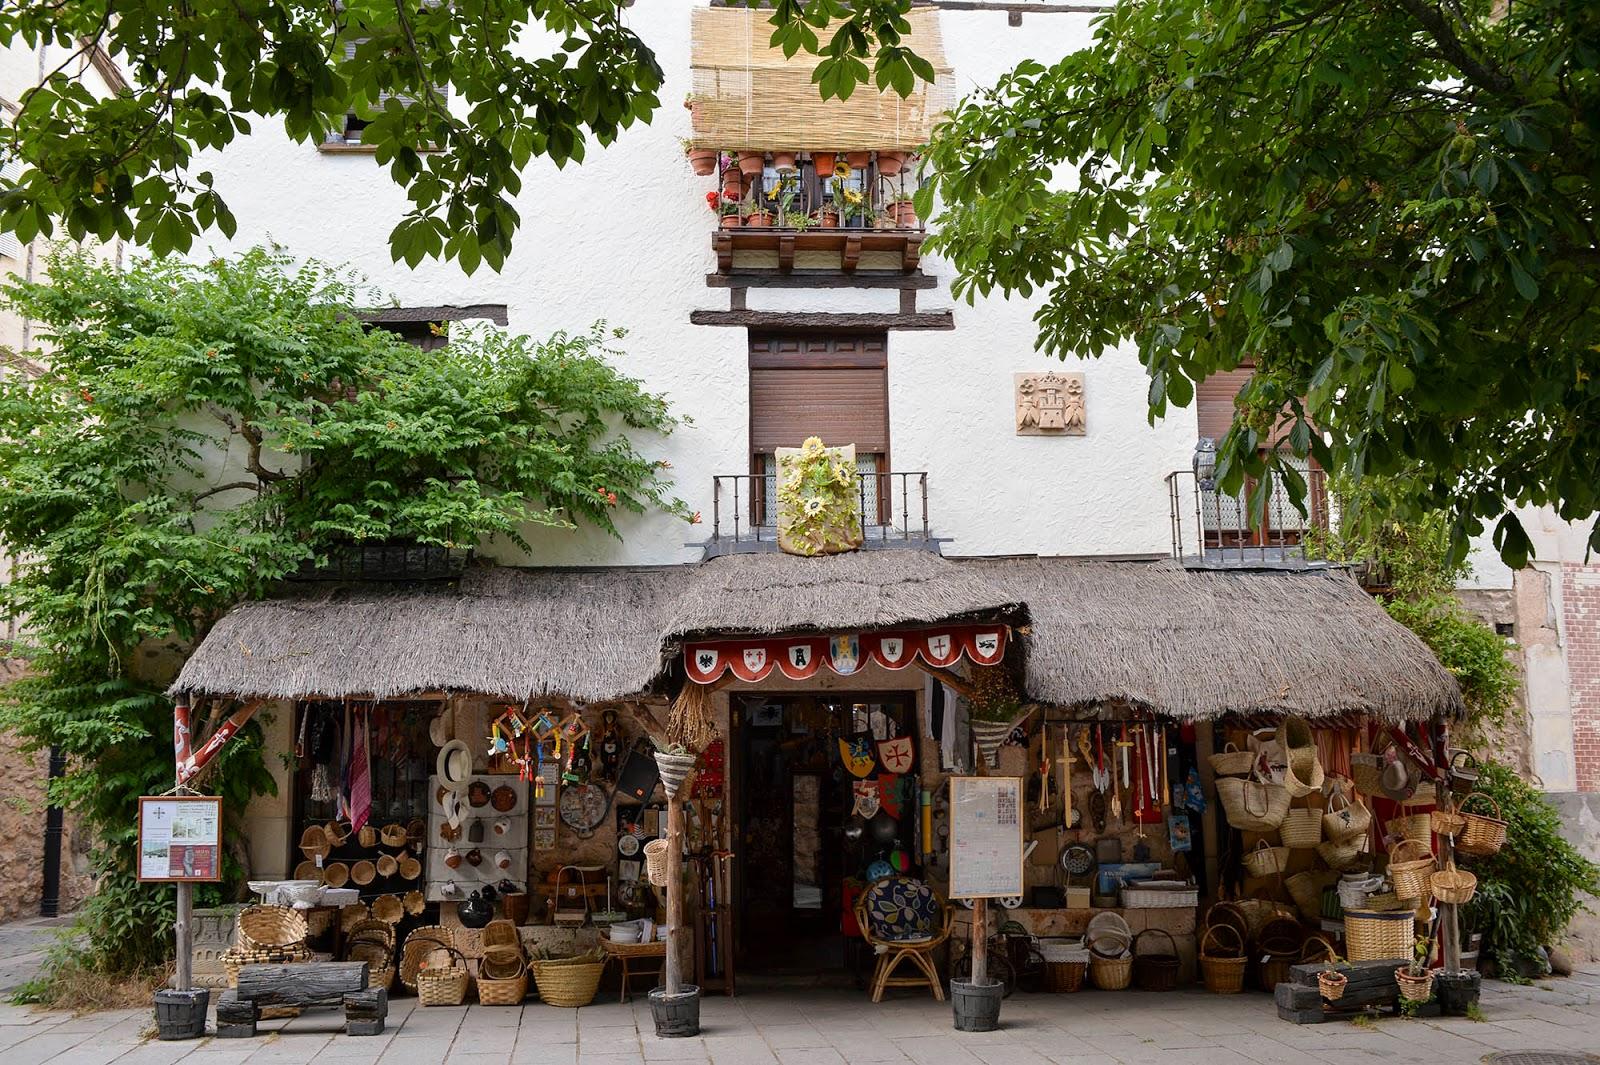 covarrubias burgos spain castile leon timber house beautiful village